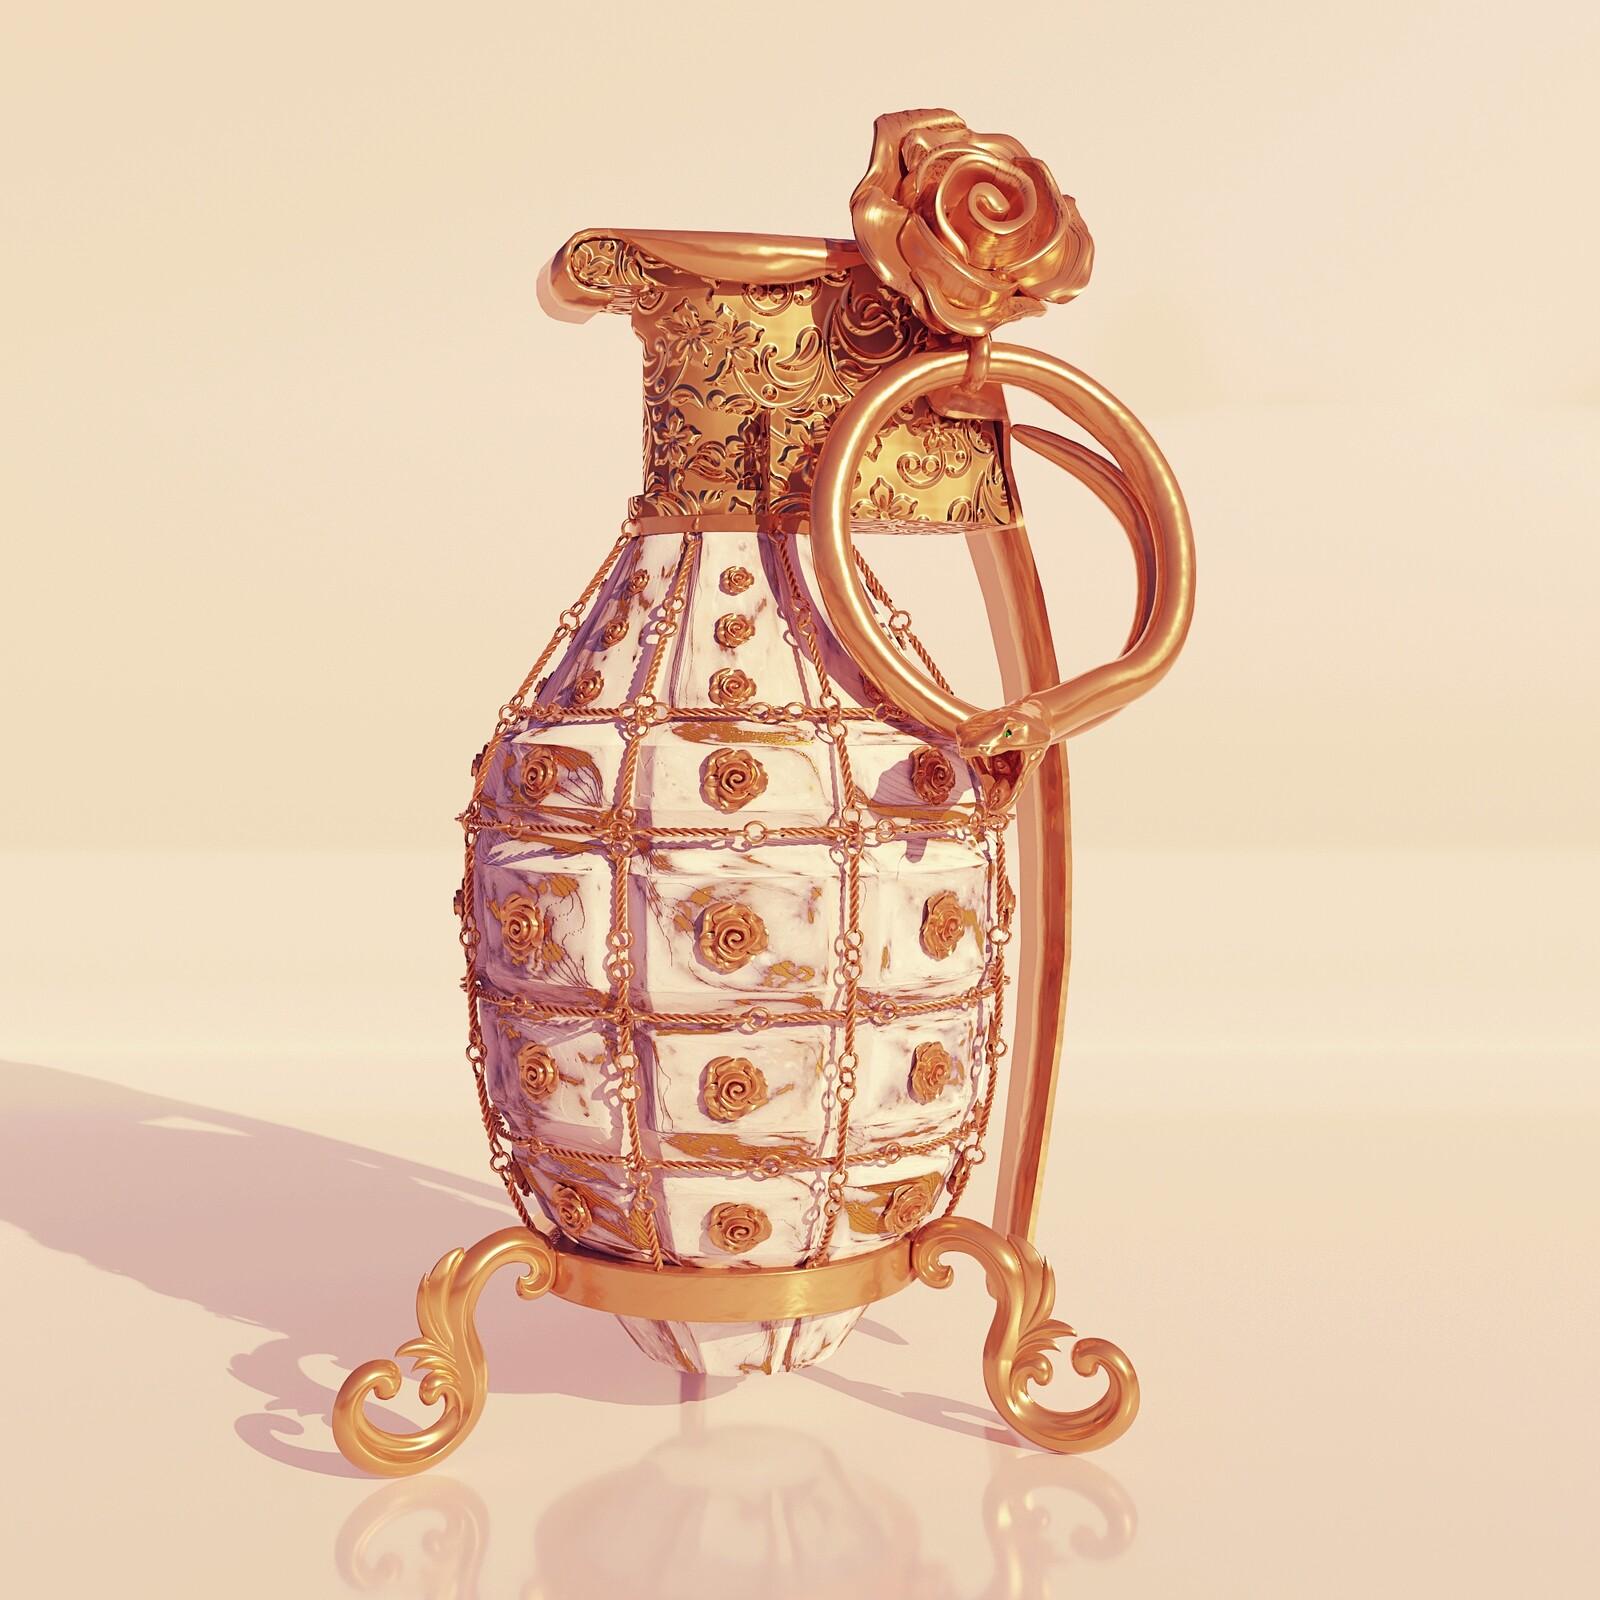 Pyrobolus Convenusto - Gold Vein Marble